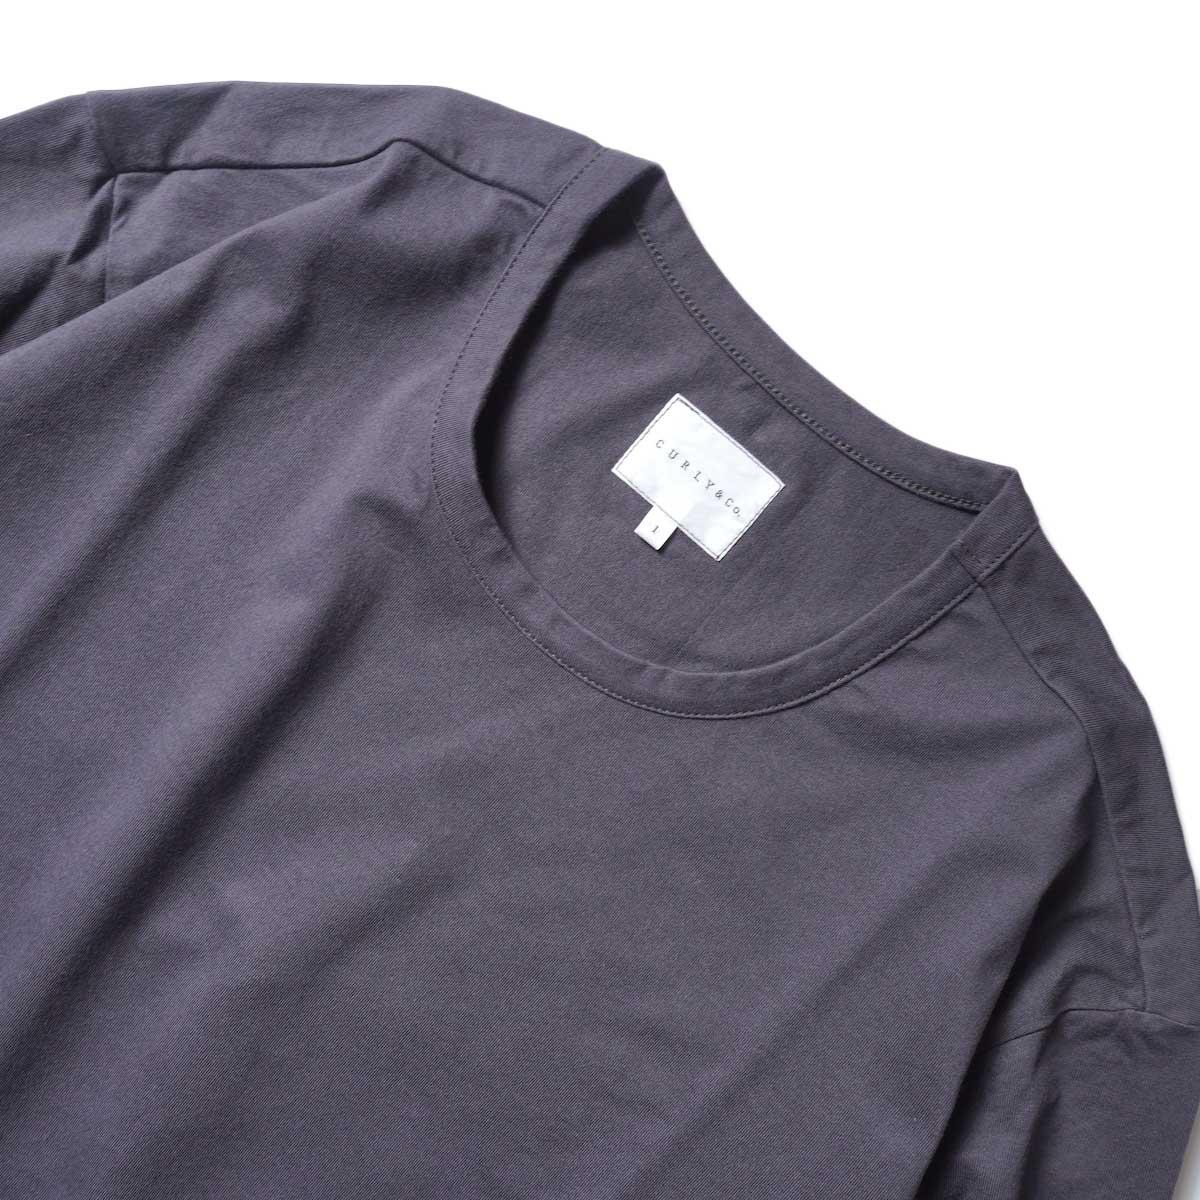 CURLY / ELS L/S CN TEE (Charcoal)ネック